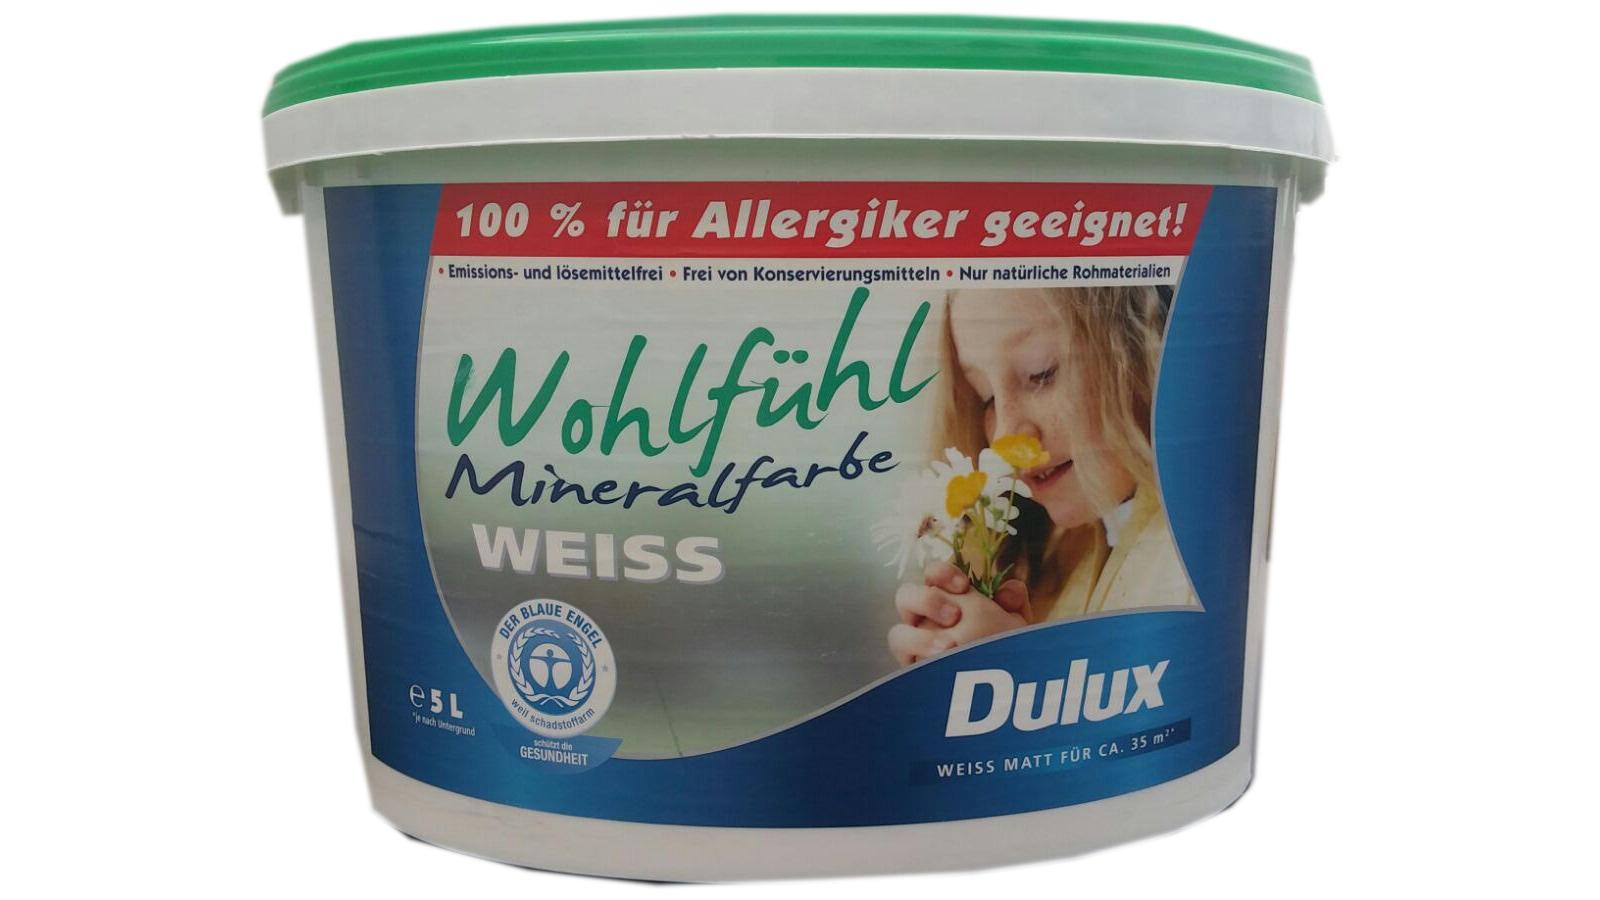 dulux wandfarbe wohlf hl mineralfarbe 100 allergiker geeignet wei matt 5 liter. Black Bedroom Furniture Sets. Home Design Ideas